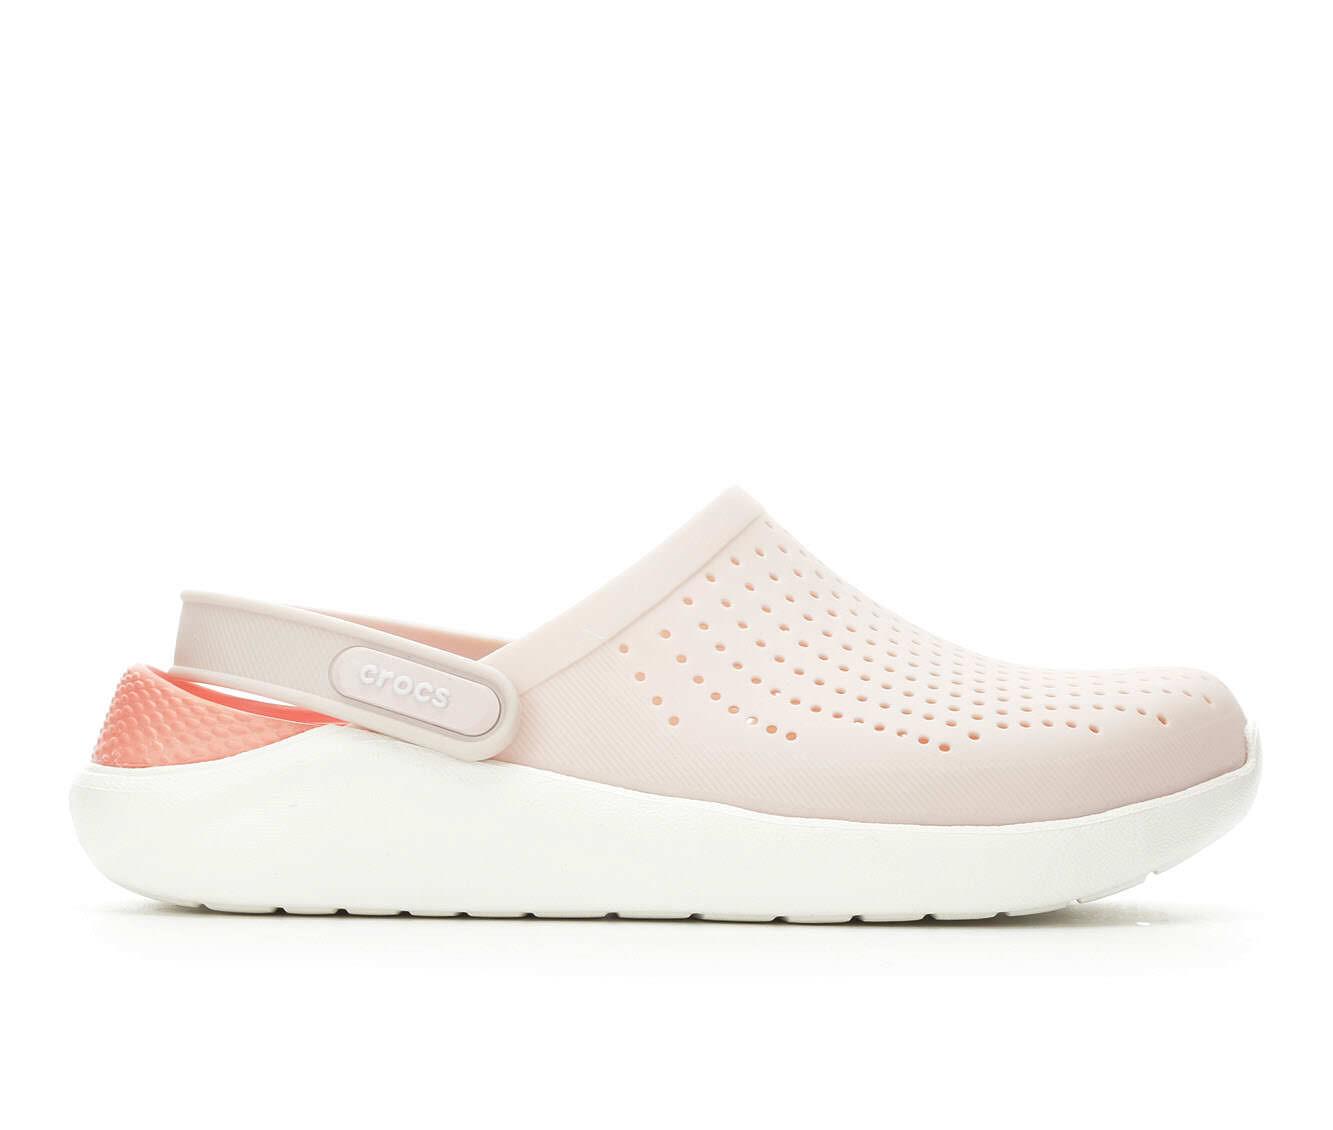 Women's Crocs LiteRide Clog Barely Pink/EWH